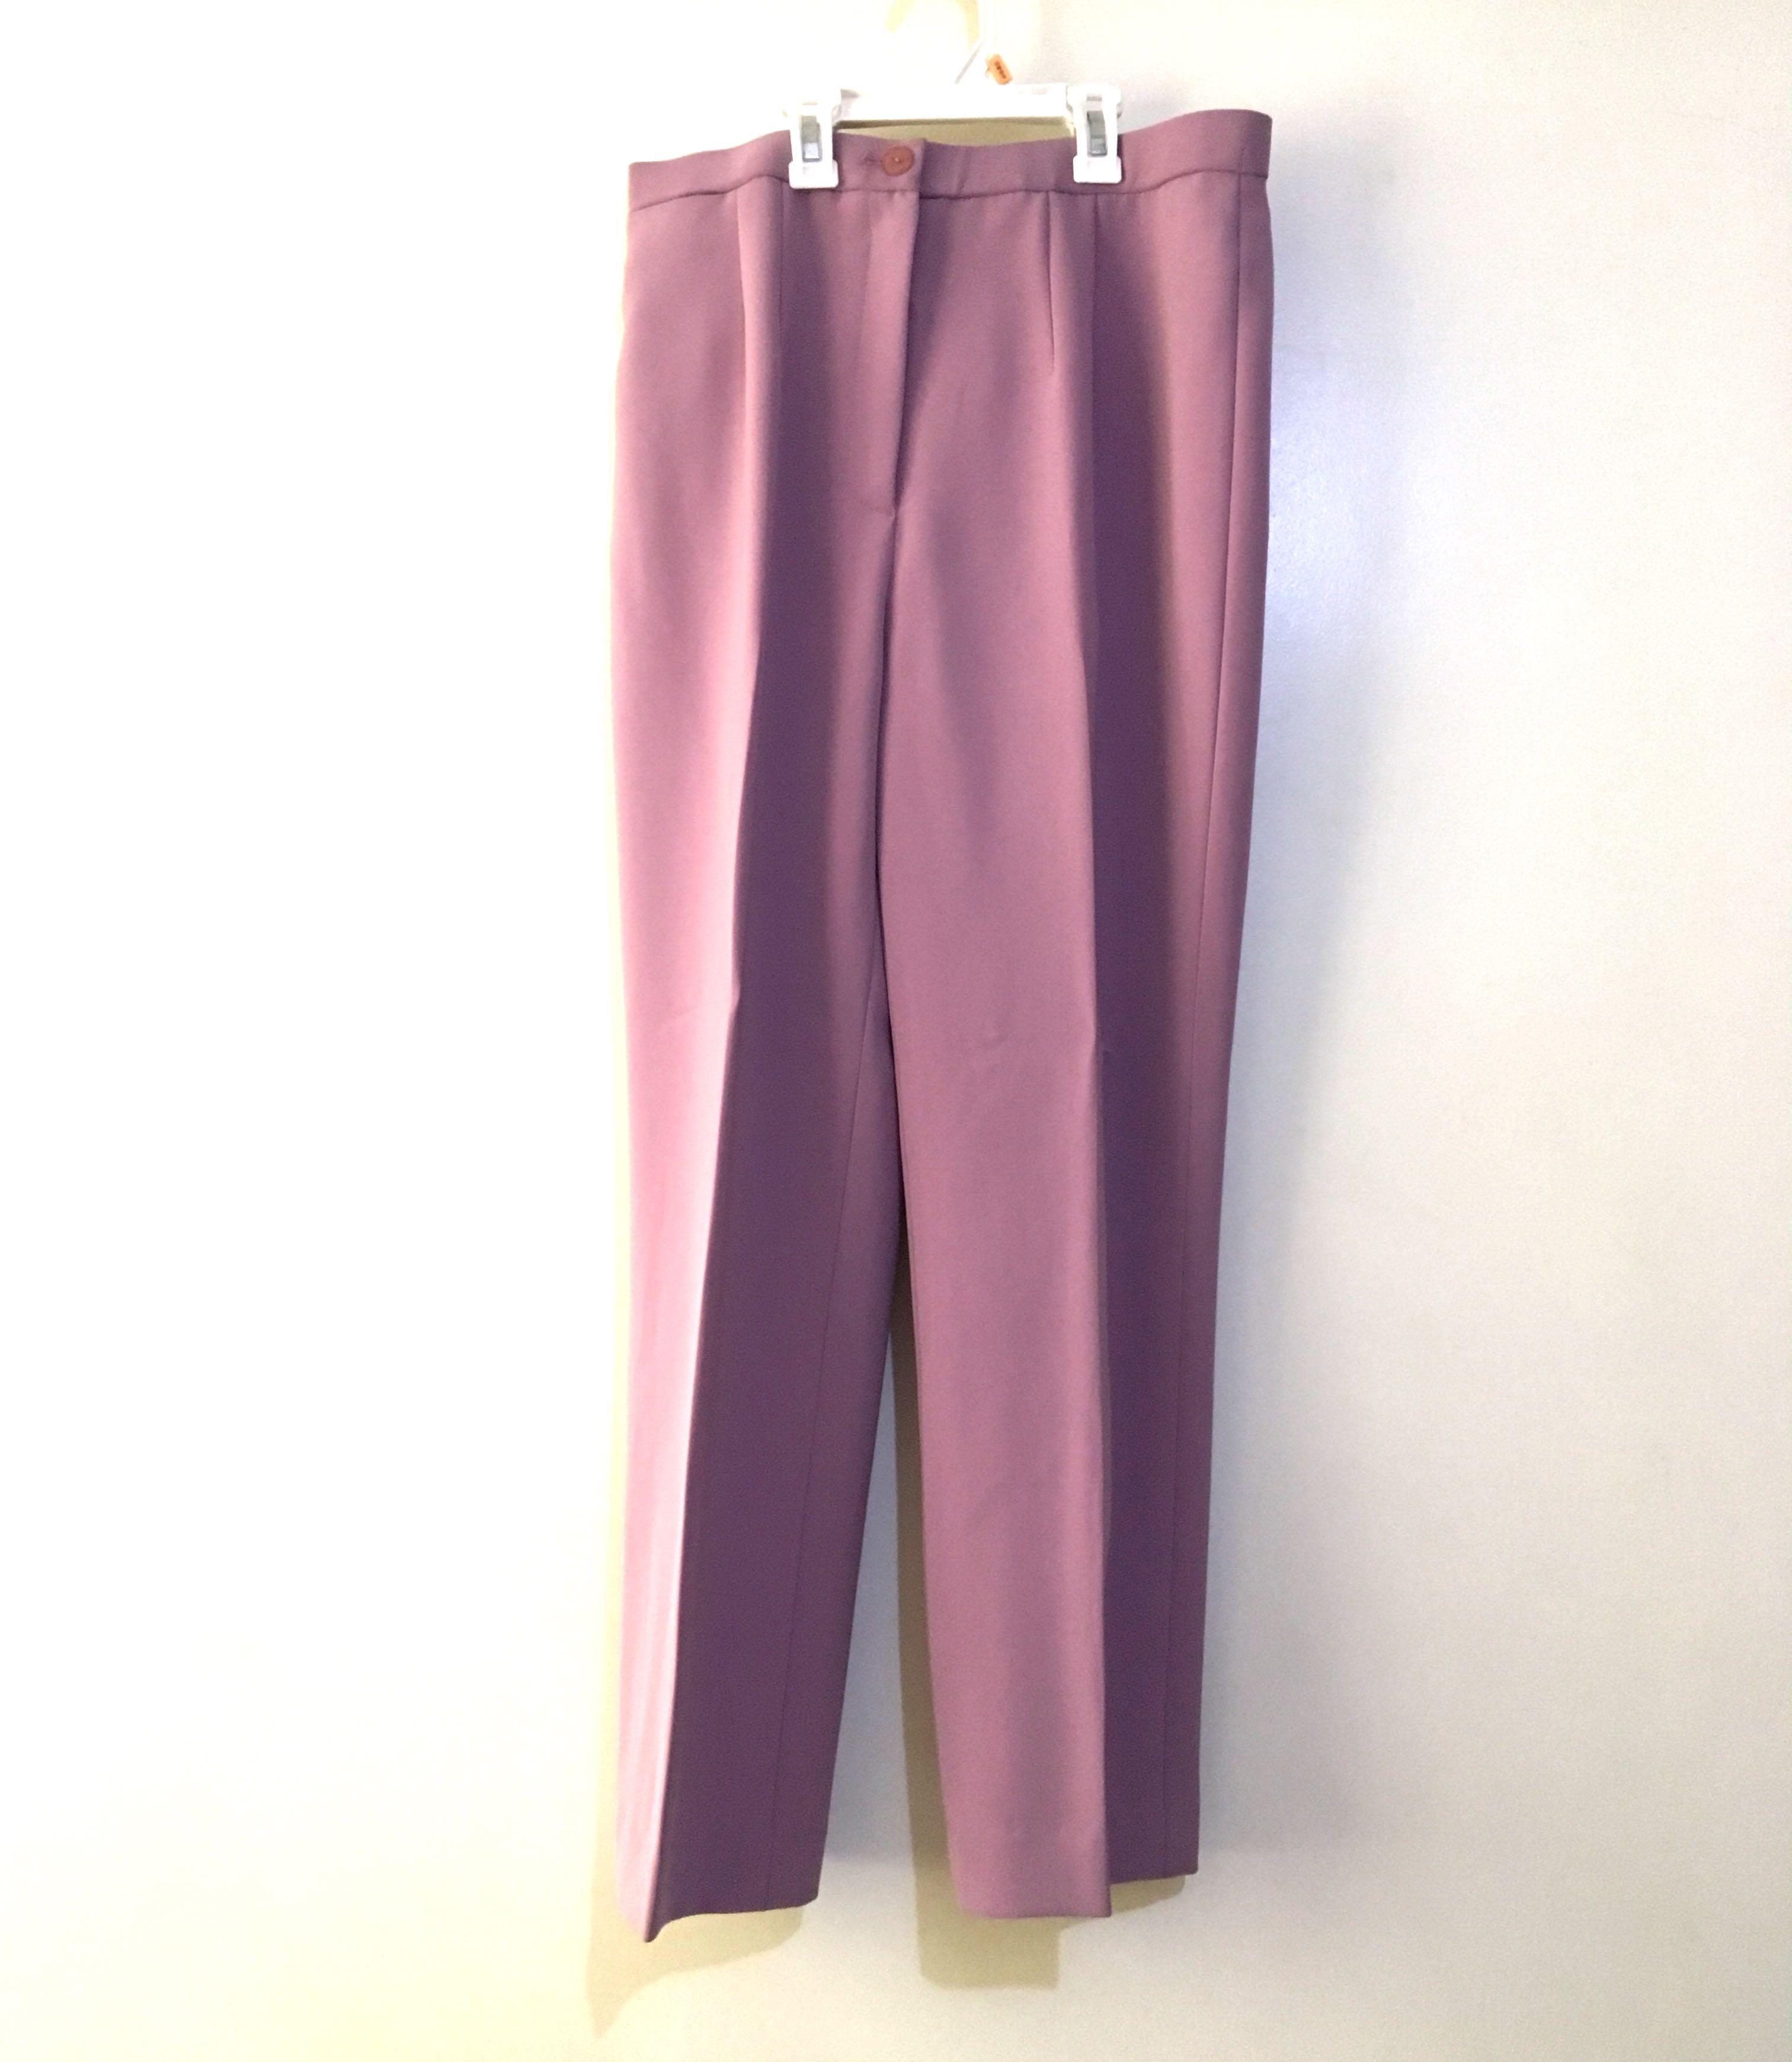 Charity Sale! Pastel Lavendar Women's Dress Work Office Pants Size Large